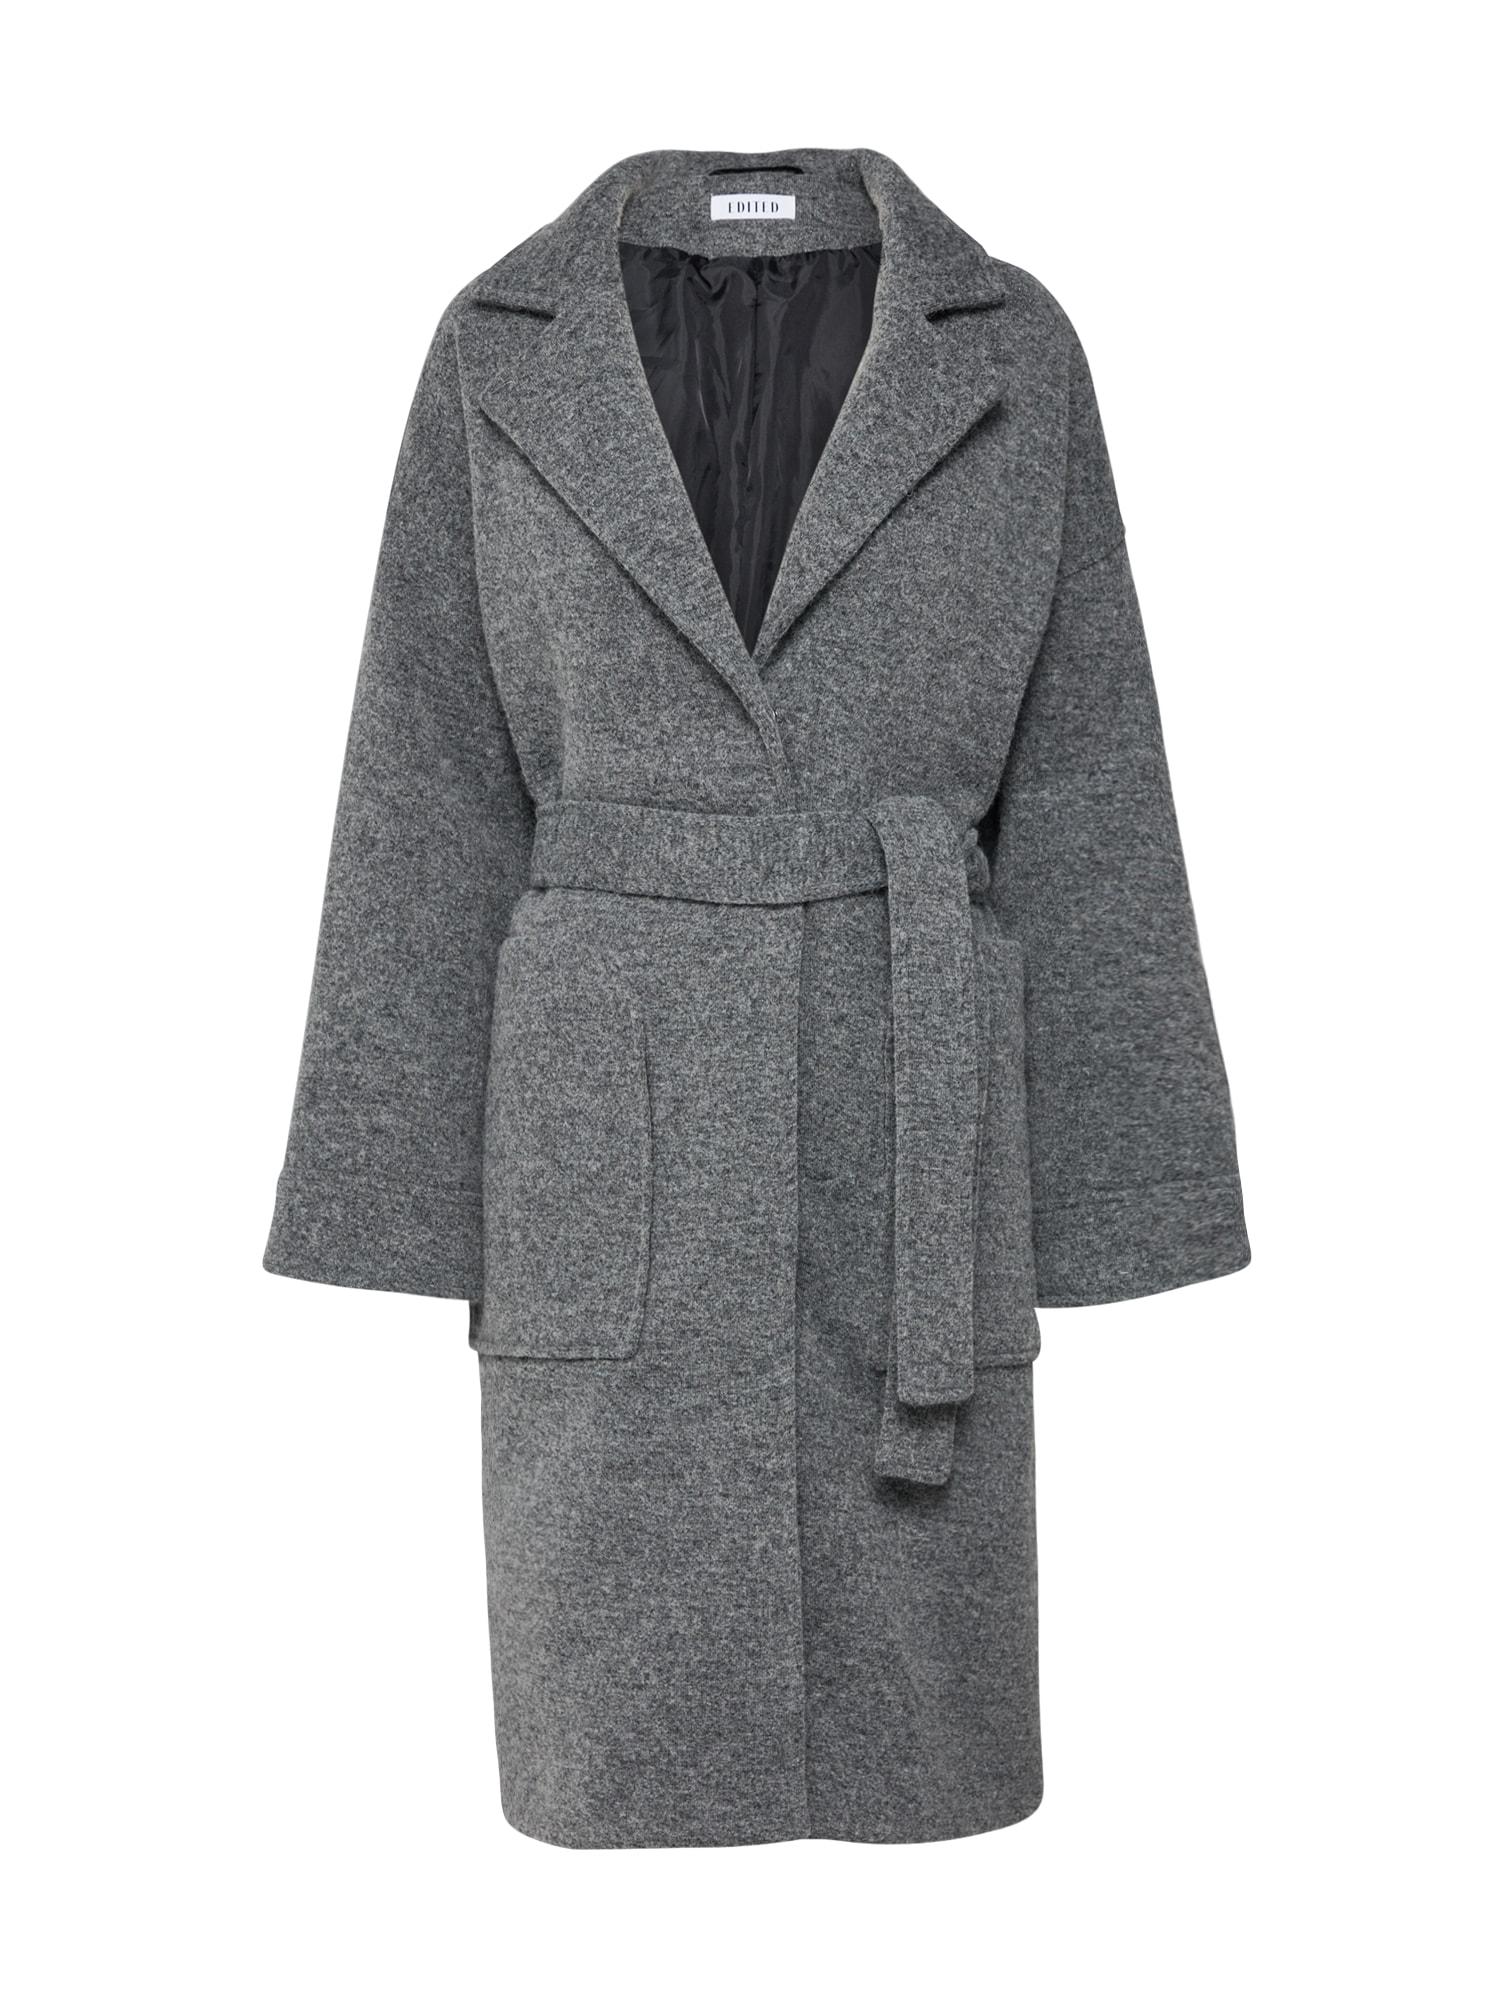 EDITED Žieminis paltas 'Casie' margai pilka